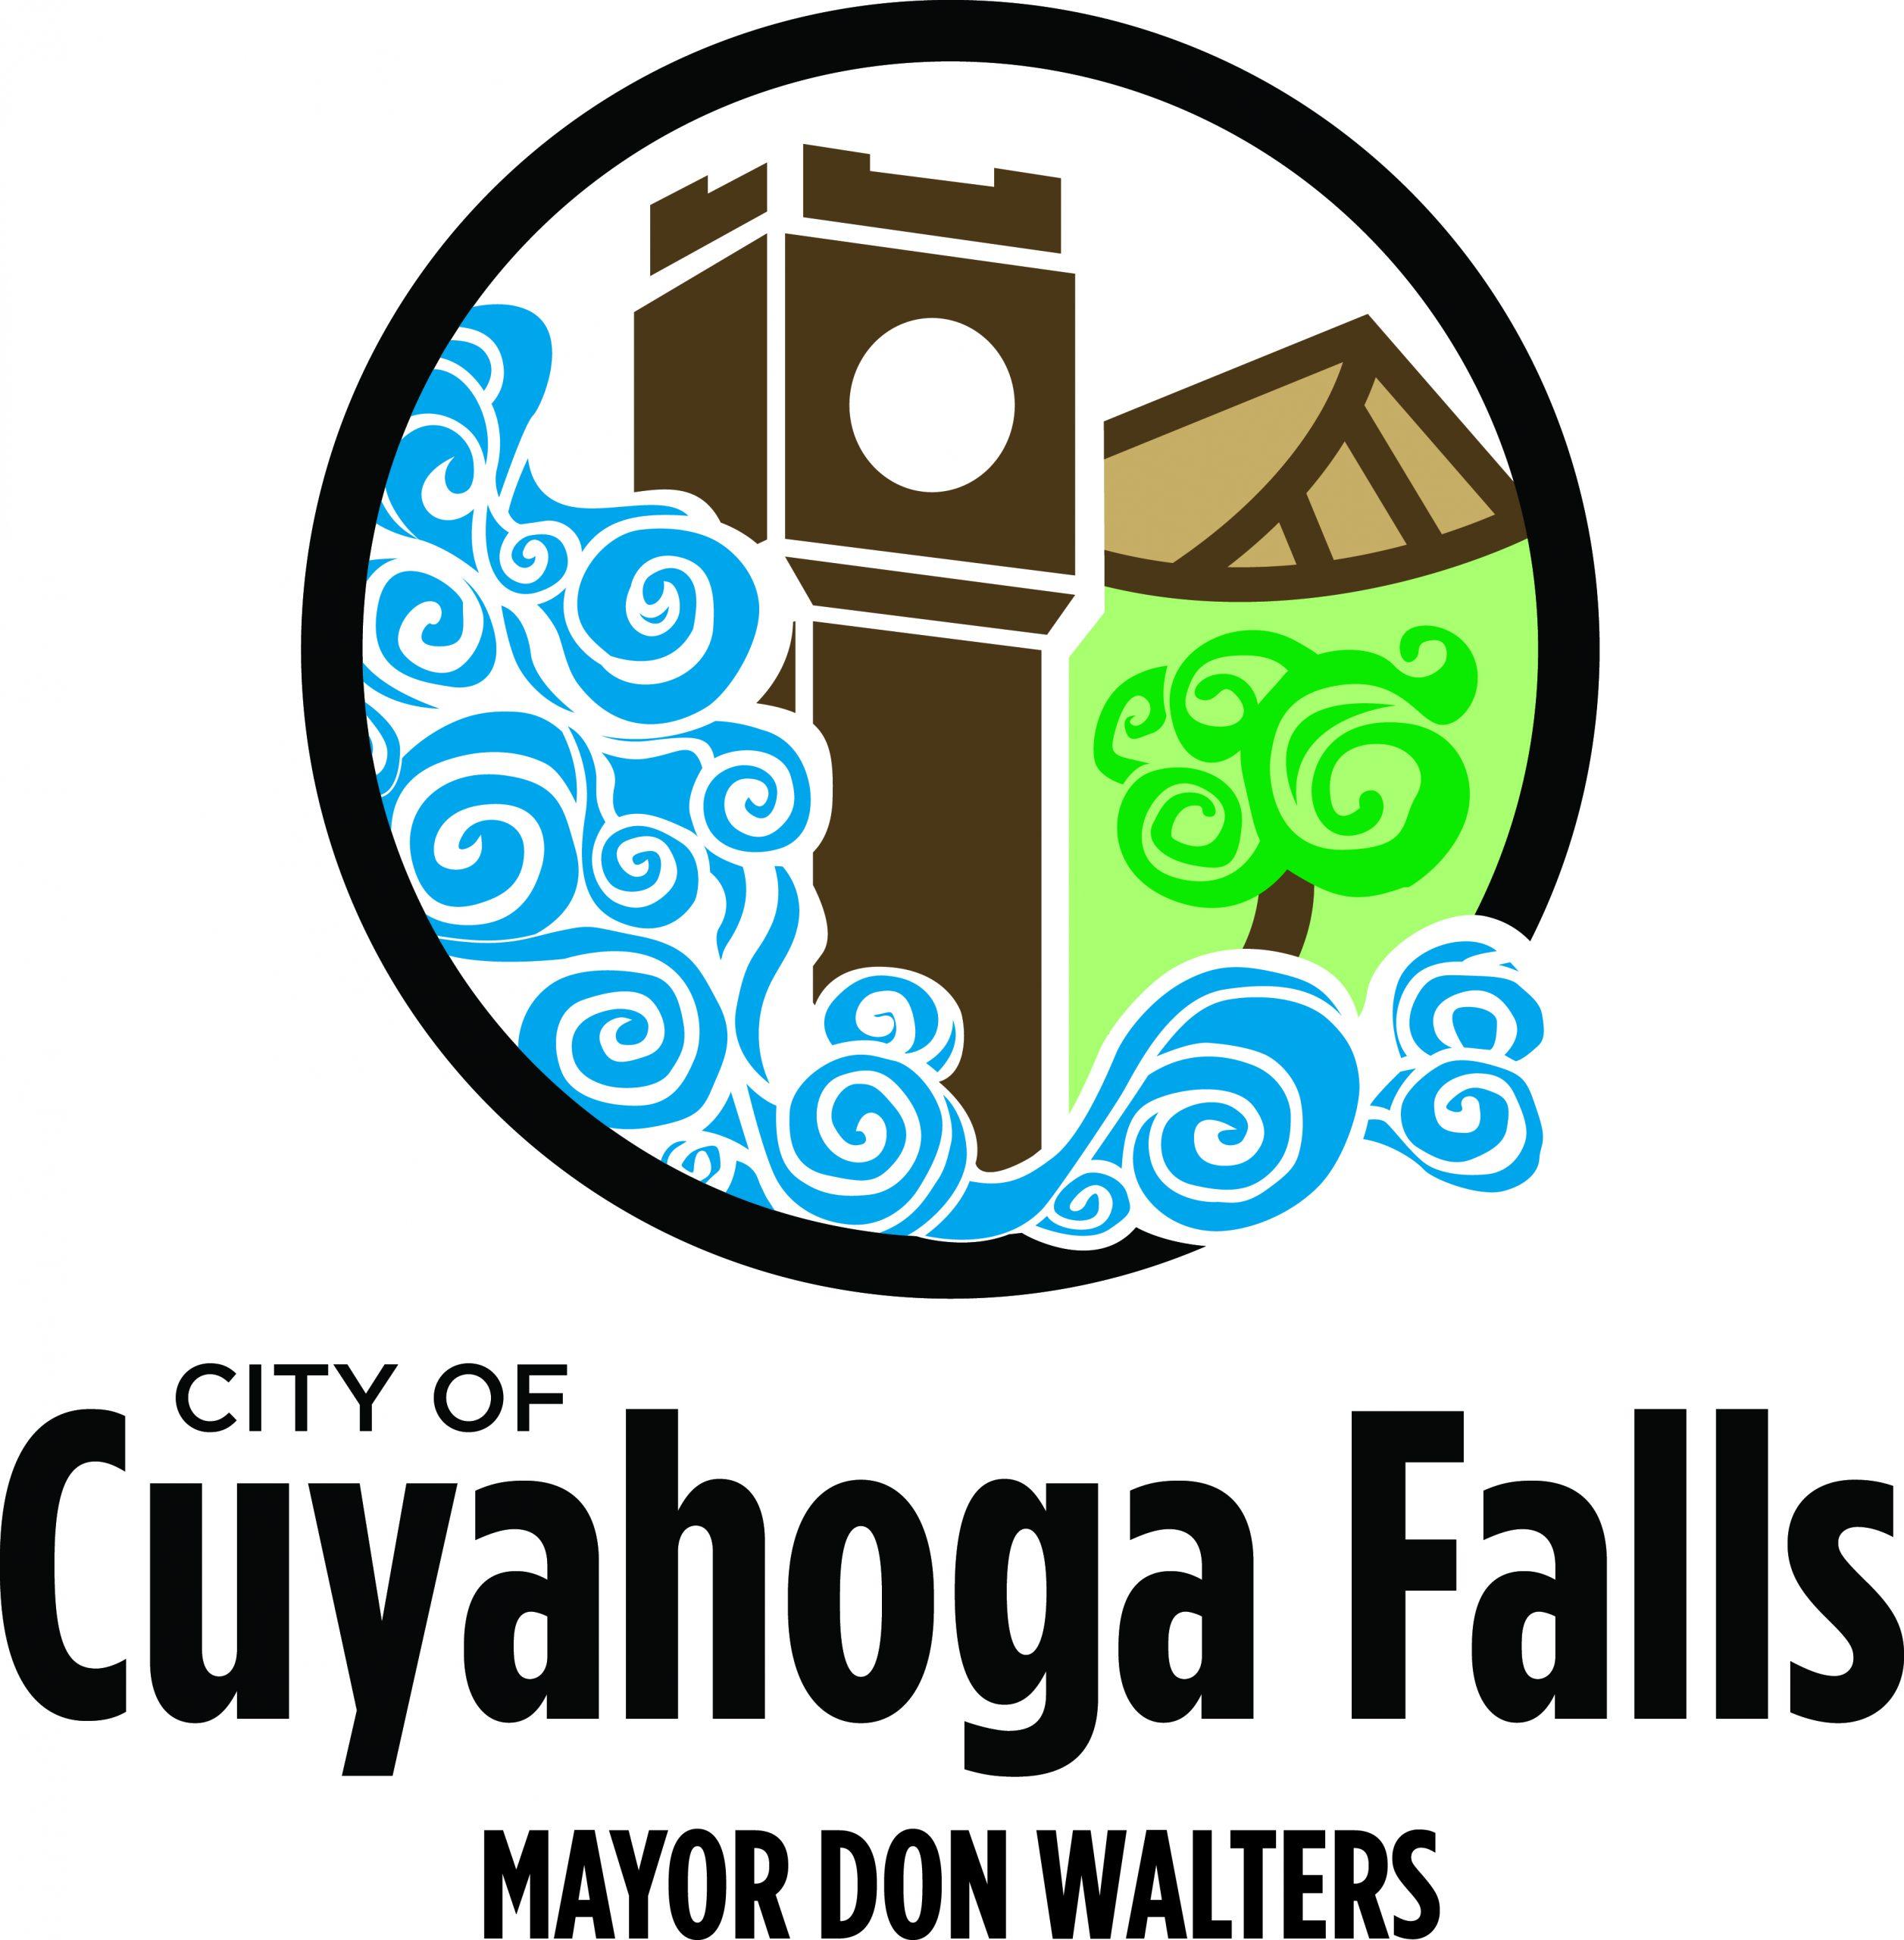 City of Cuyahoga Falls